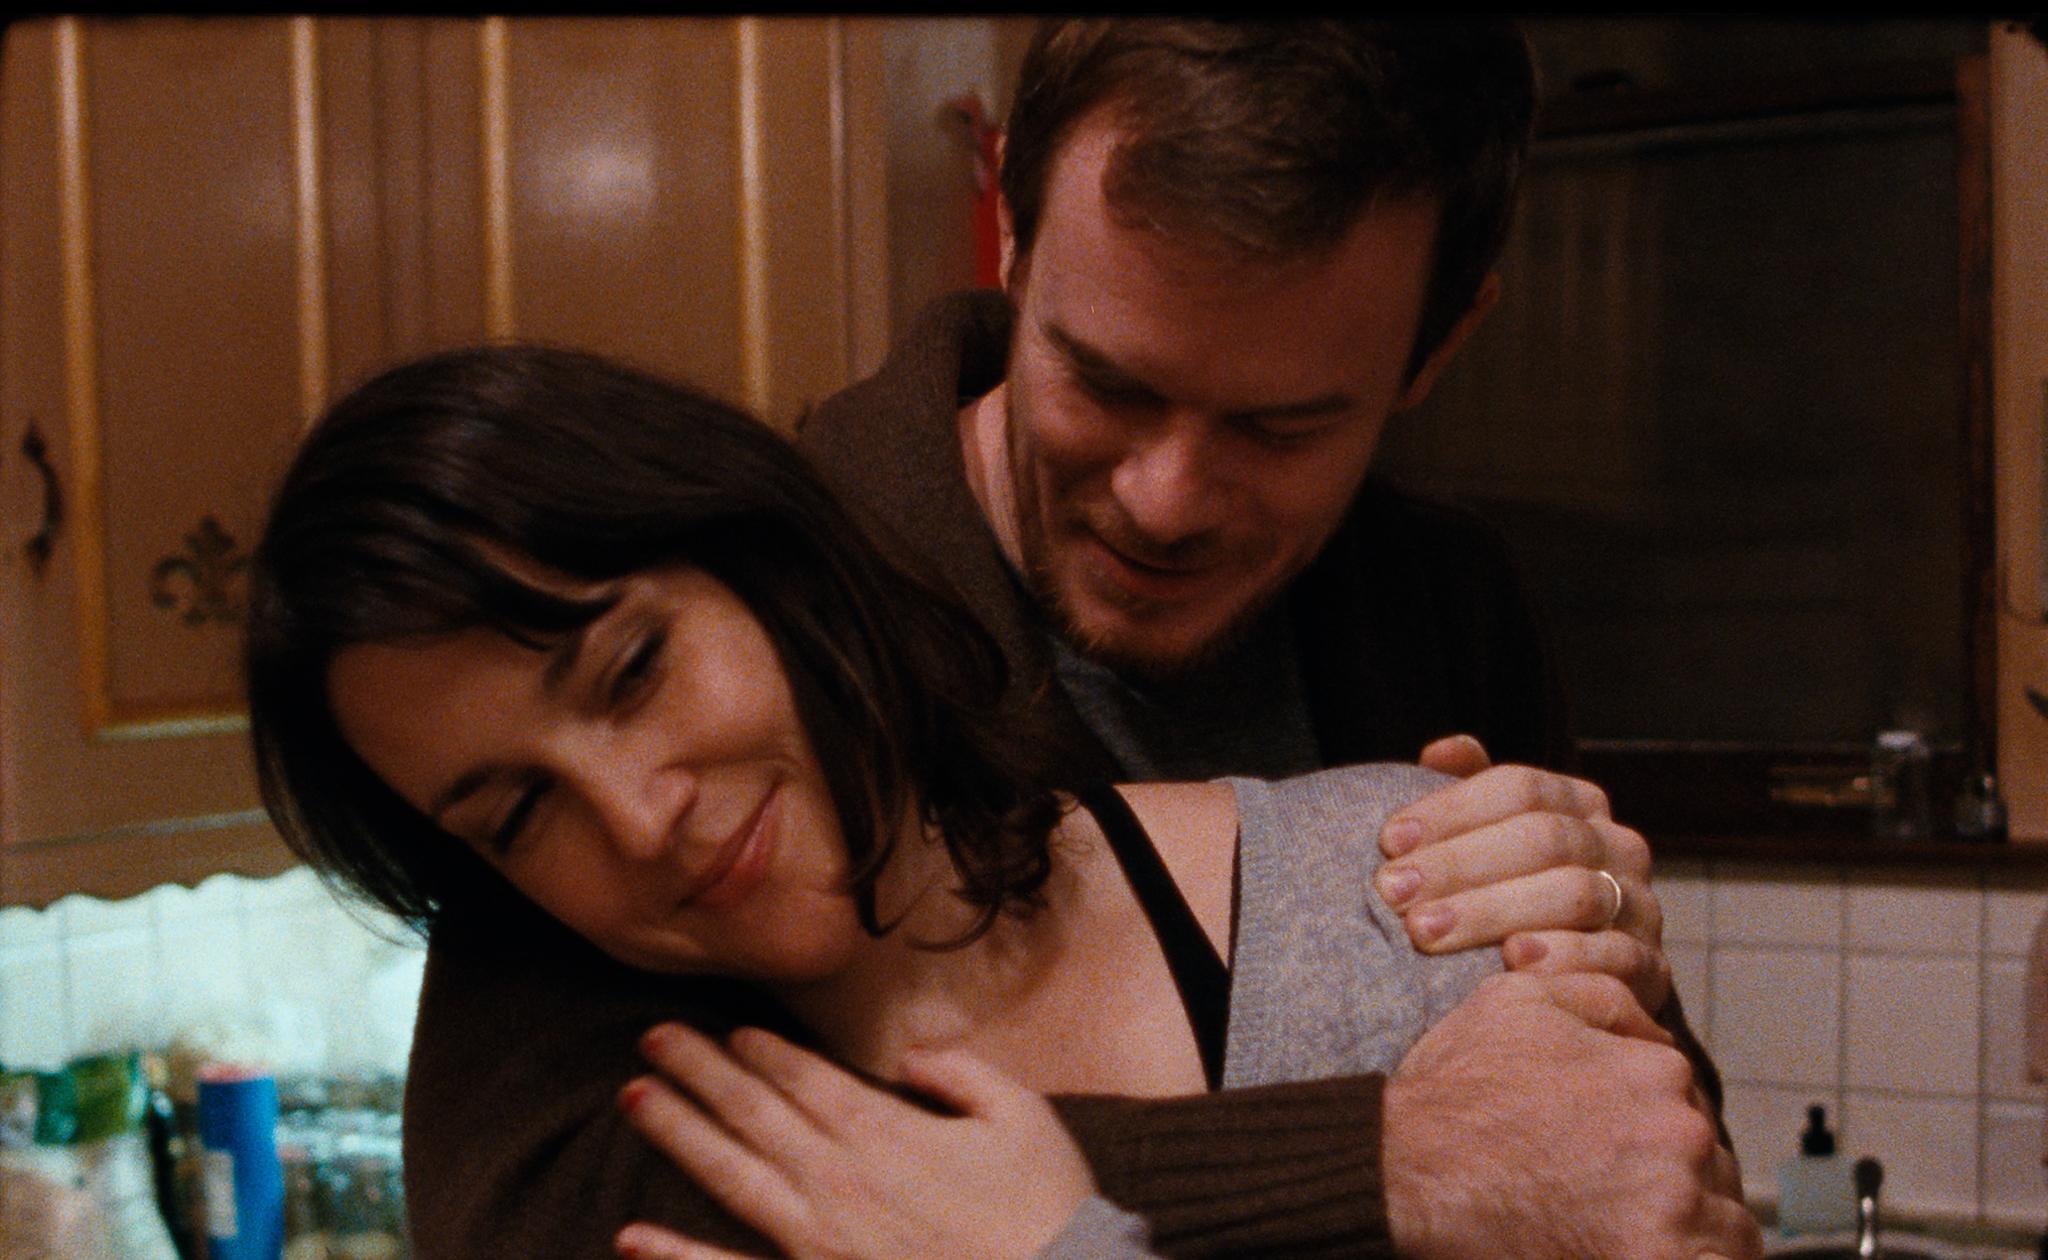 Melanie Lynskey and Joe Swanberg in HAPPY CHRISTMAS (Magnolia Pictures)